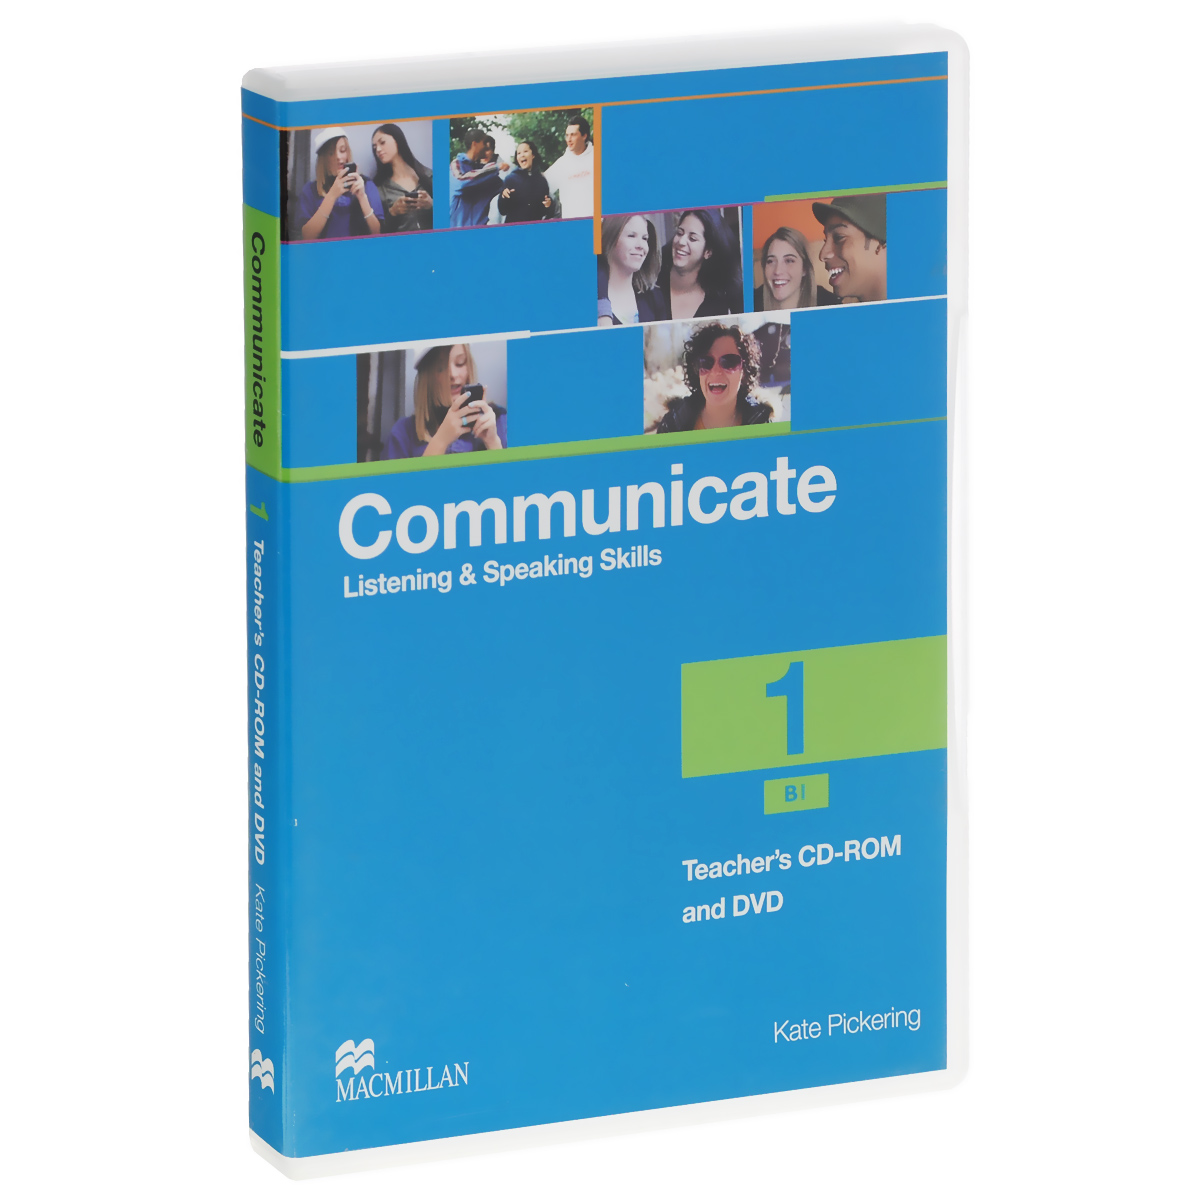 Communicate 1: Listening & Speaking Skills B1: Teacher's CD-ROM and DVD